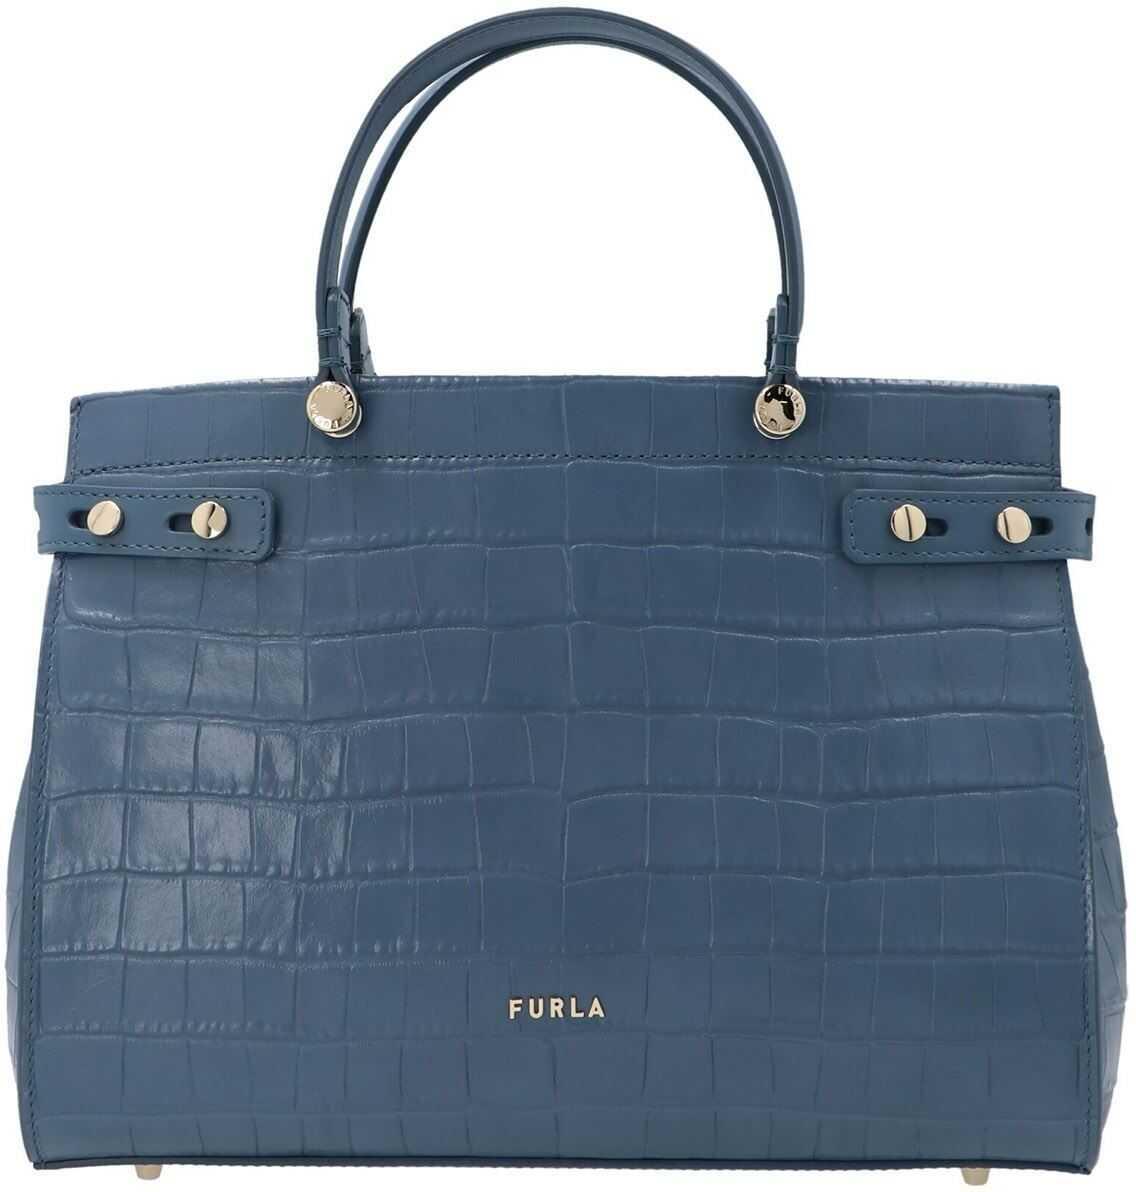 Furla Lady M M Bag In Blu Denim Color BAWCO1LKO000DE000 Blue imagine b-mall.ro